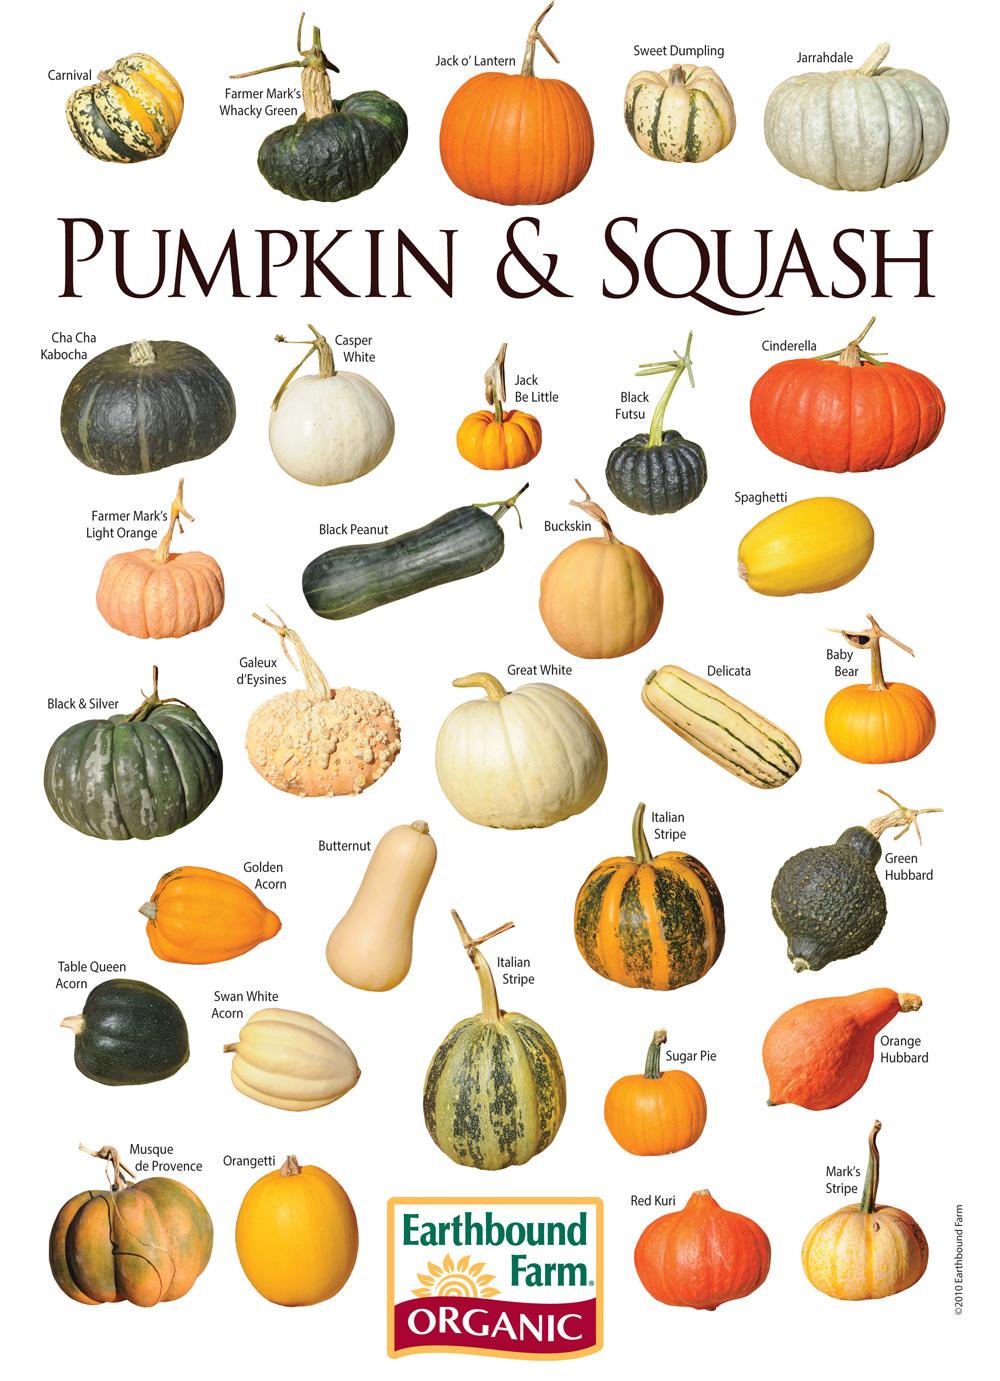 Gourd clipart pumpkin farm (Googled)  com google https://www